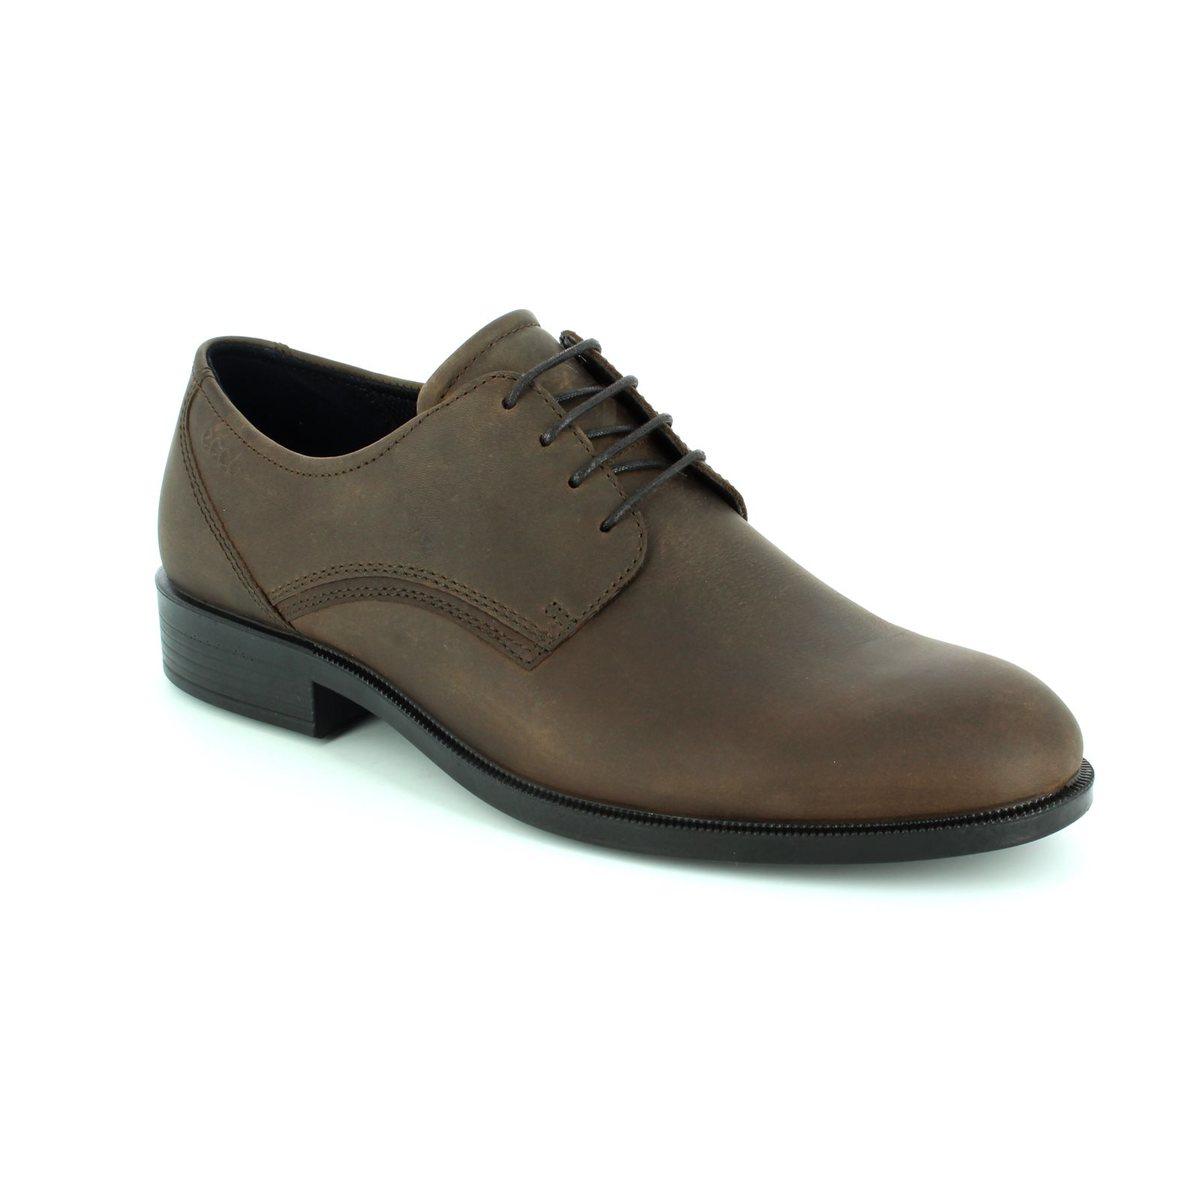 683993d8 634584/51869 Harold at Begg Shoes & Bags